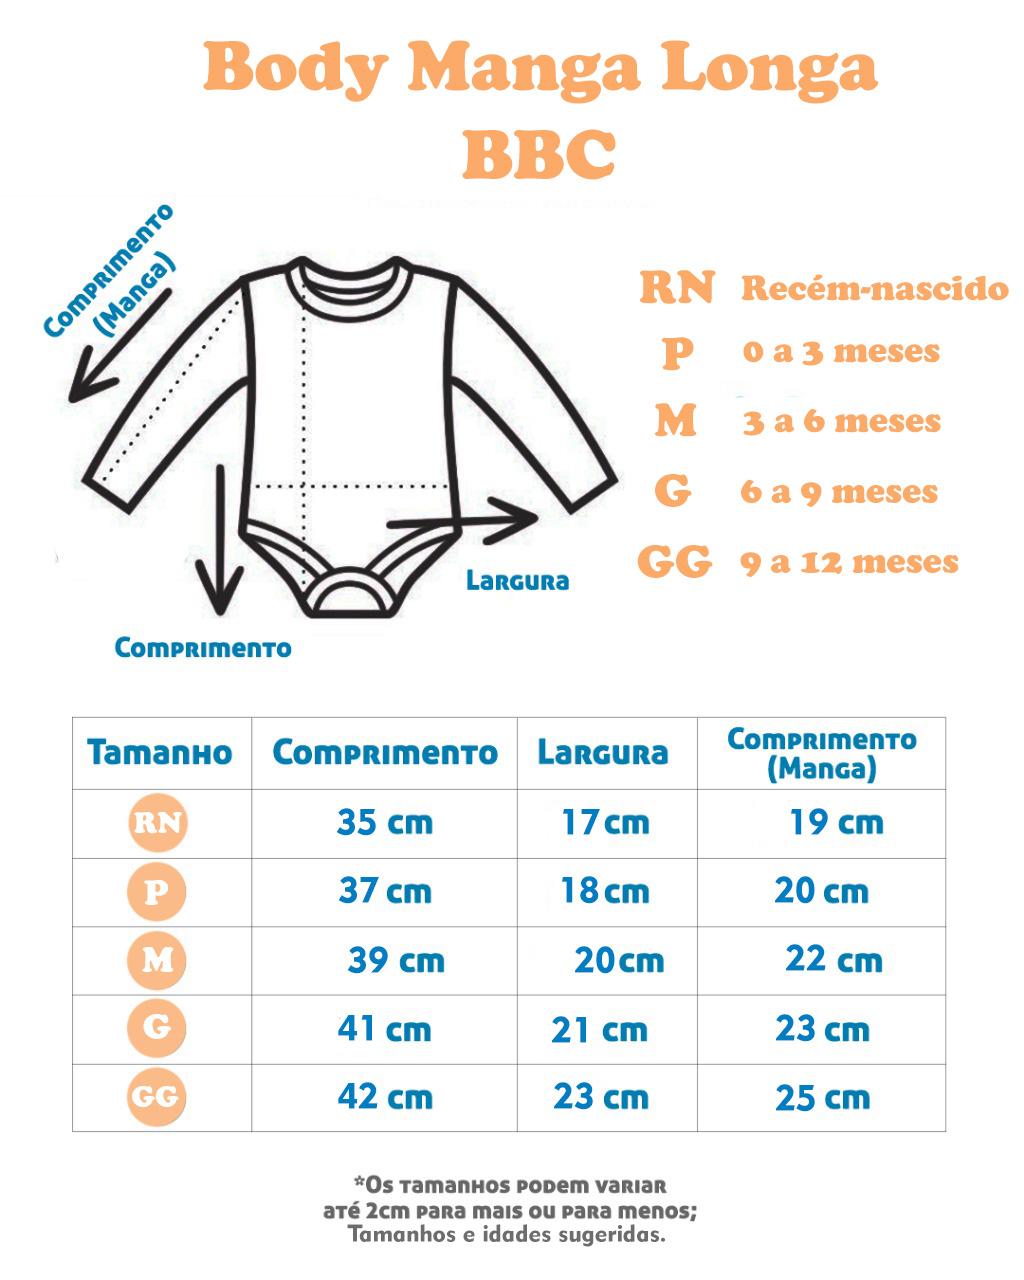 Body Manga Longa Cinza Liso (RN/P/M/G/GG)